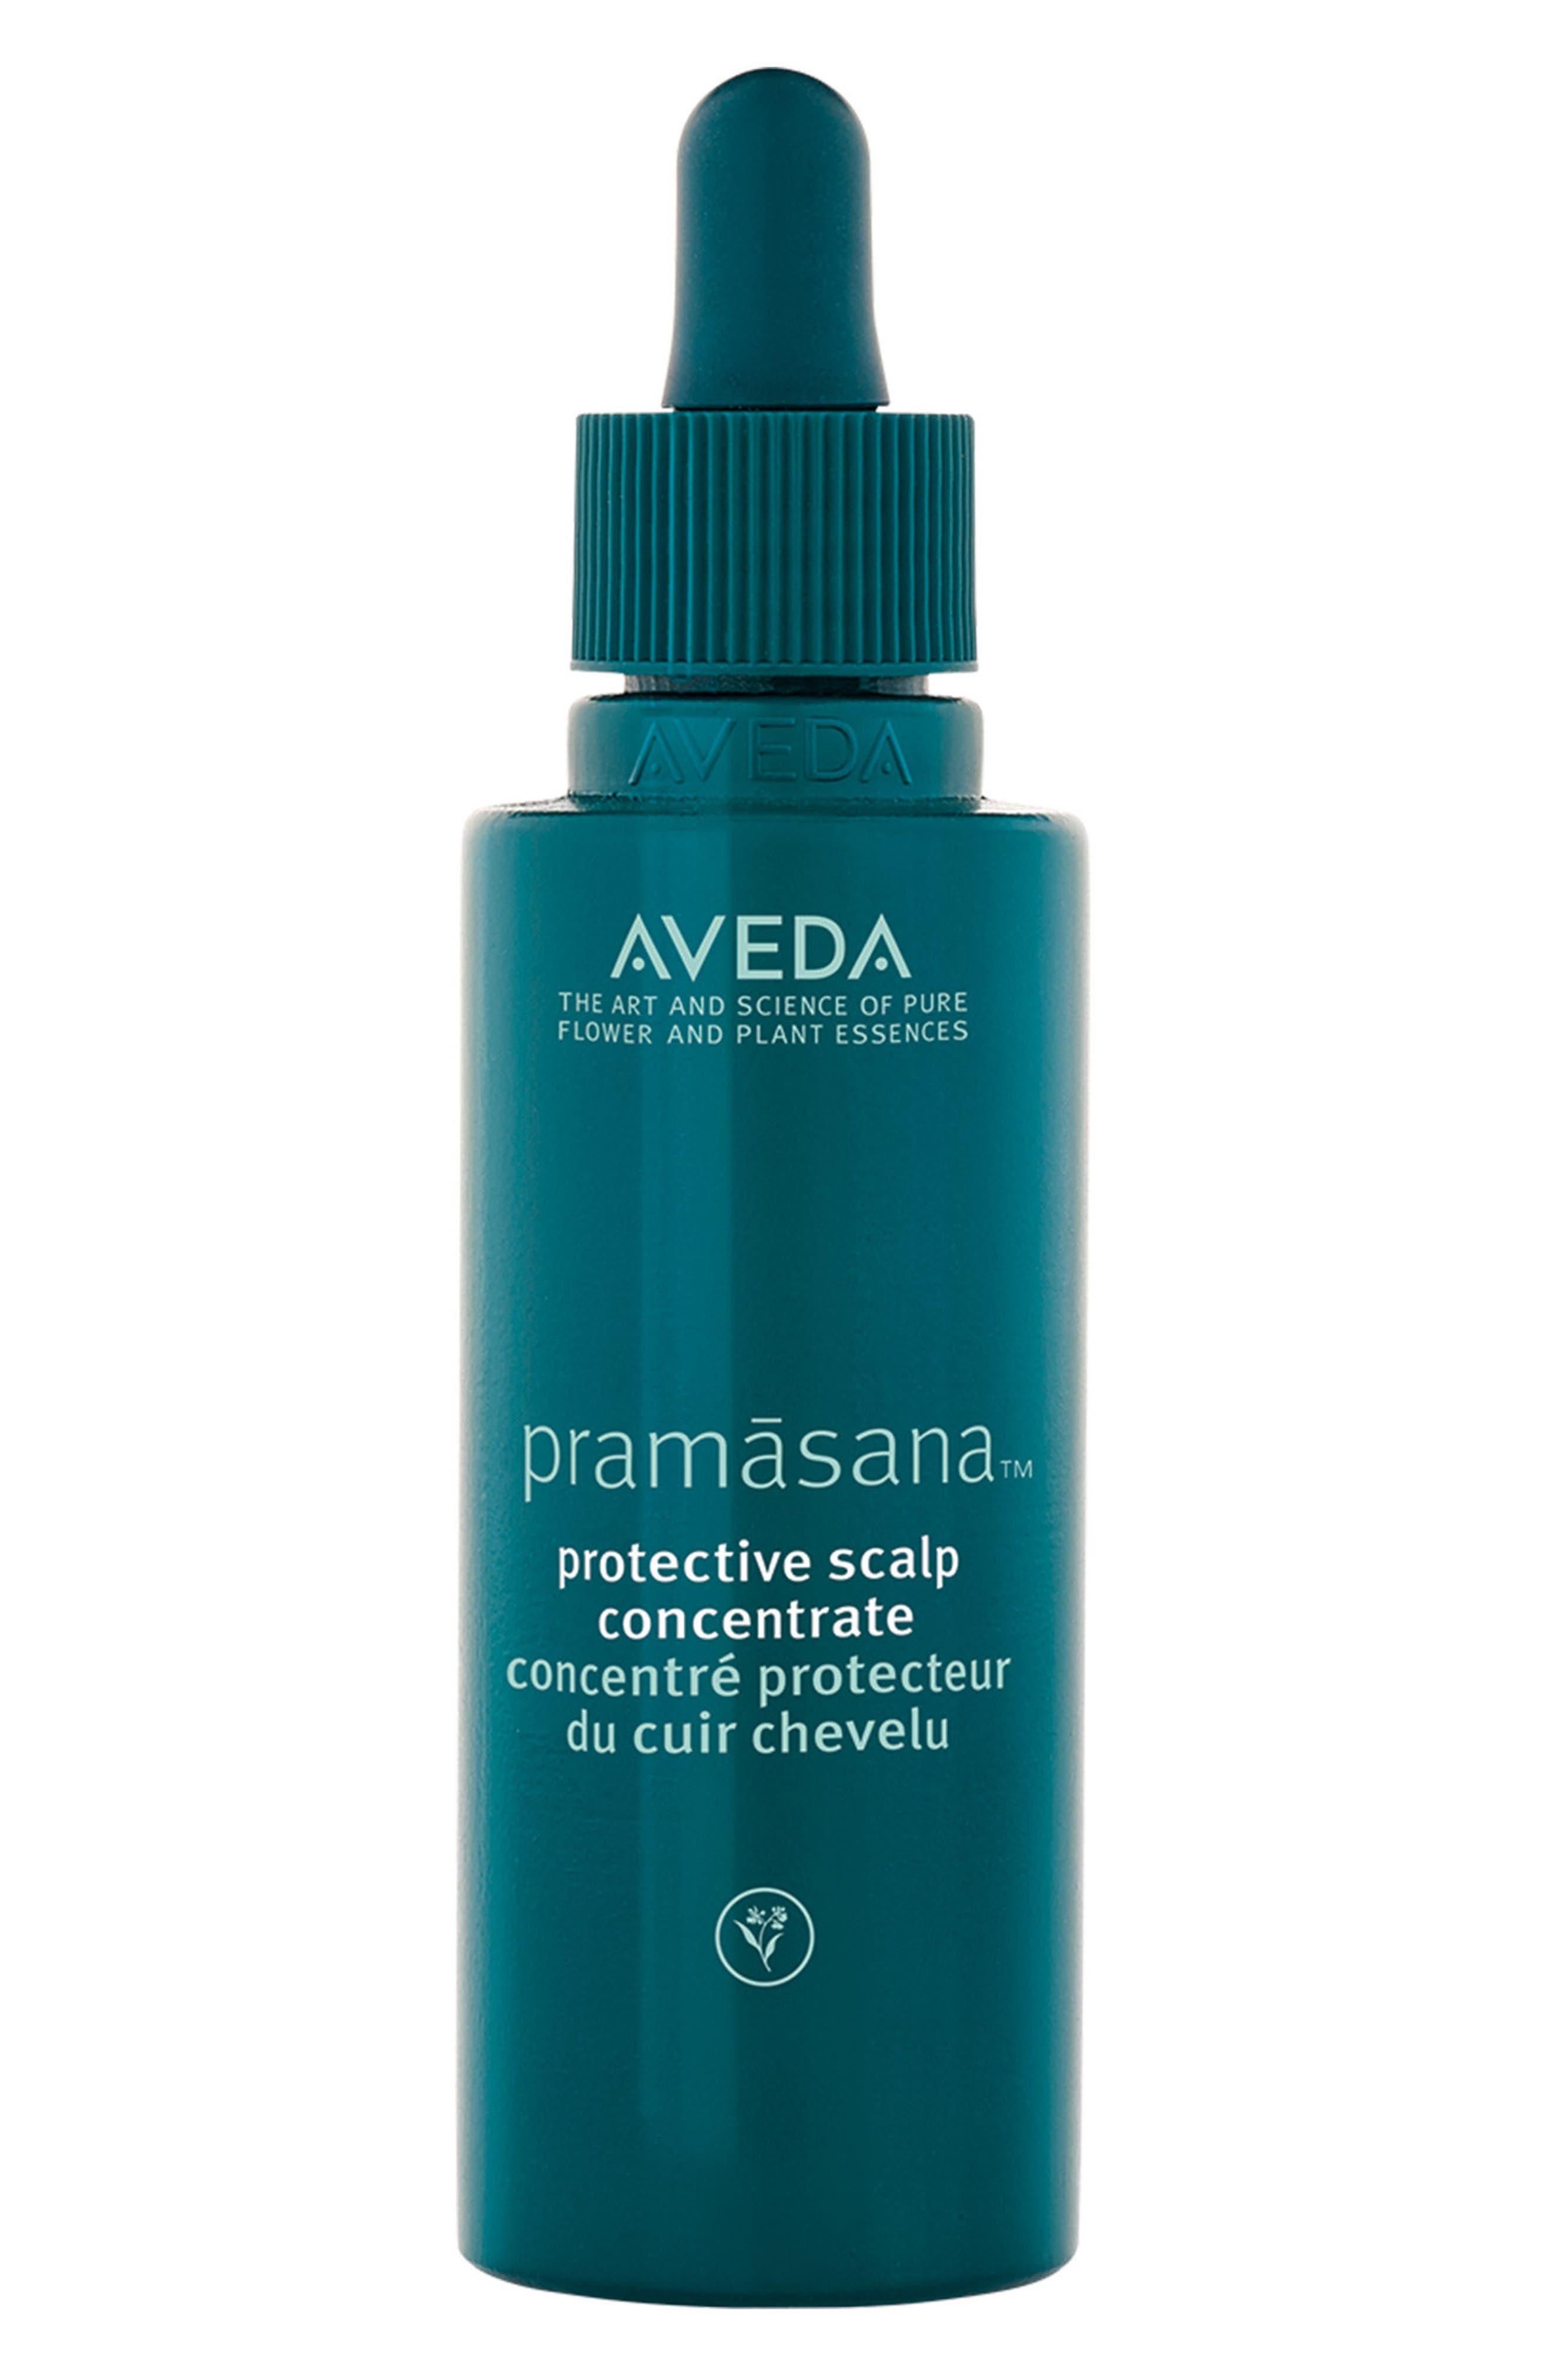 Pramasana(TM) Protective Scalp Concentrate